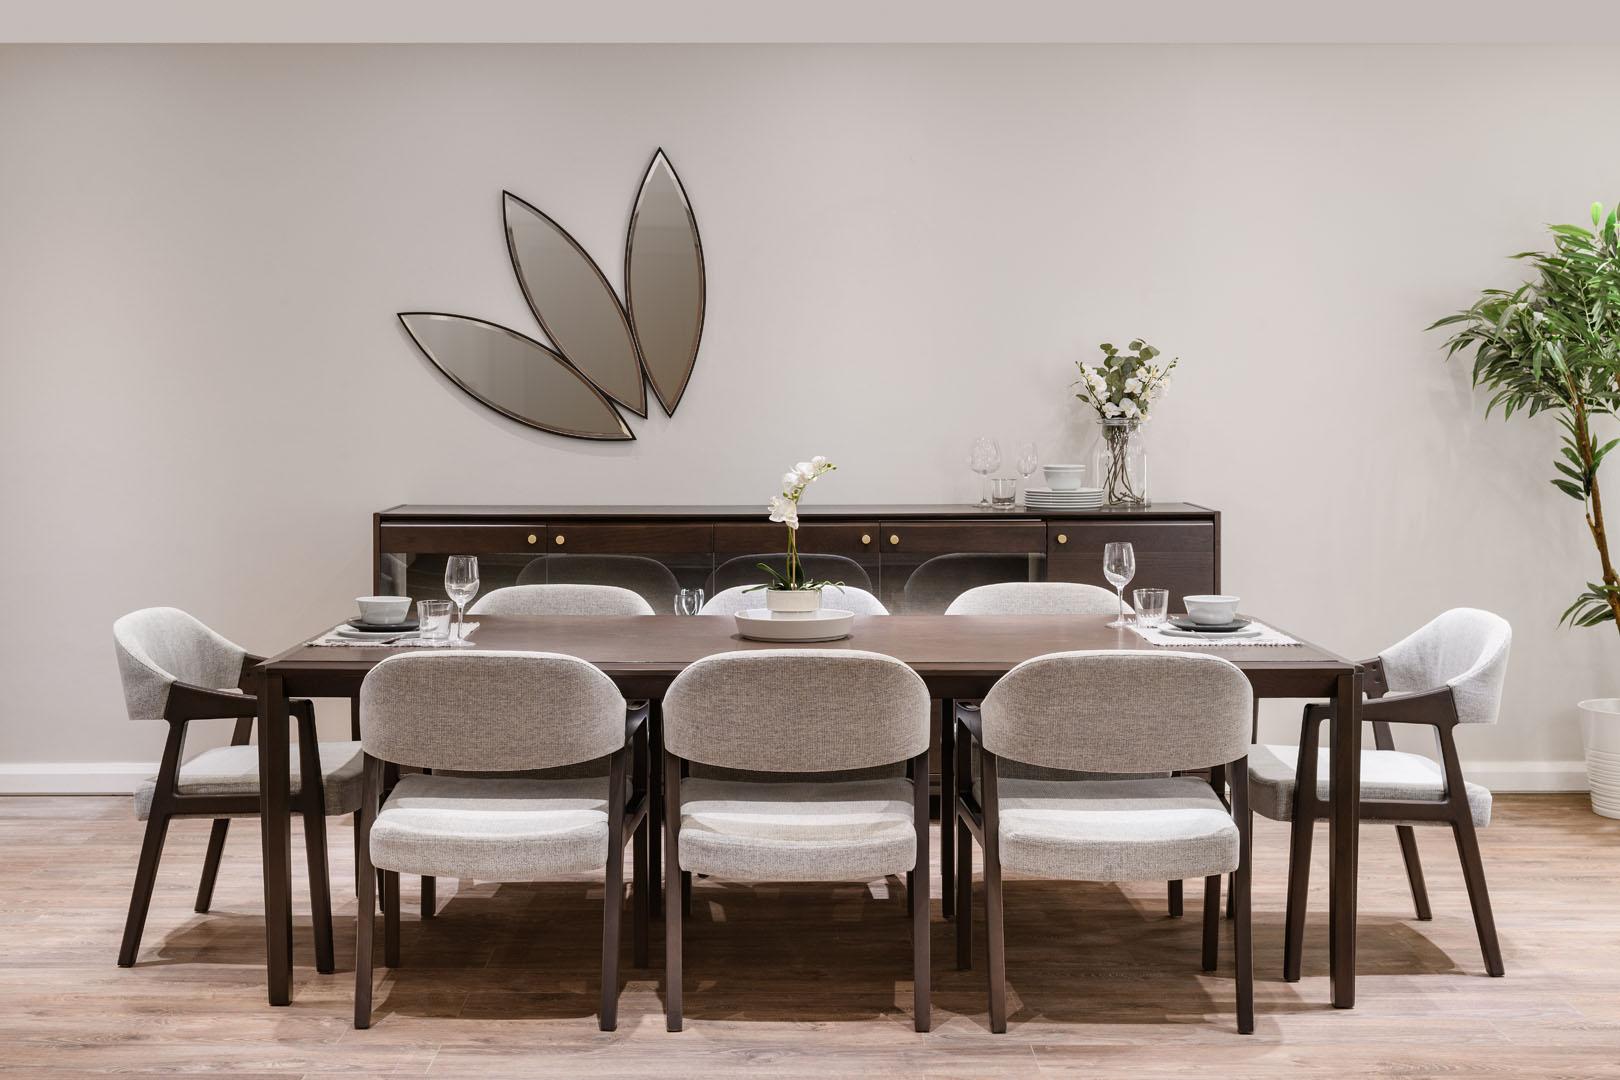 Mink dining - Pinocchio furniture